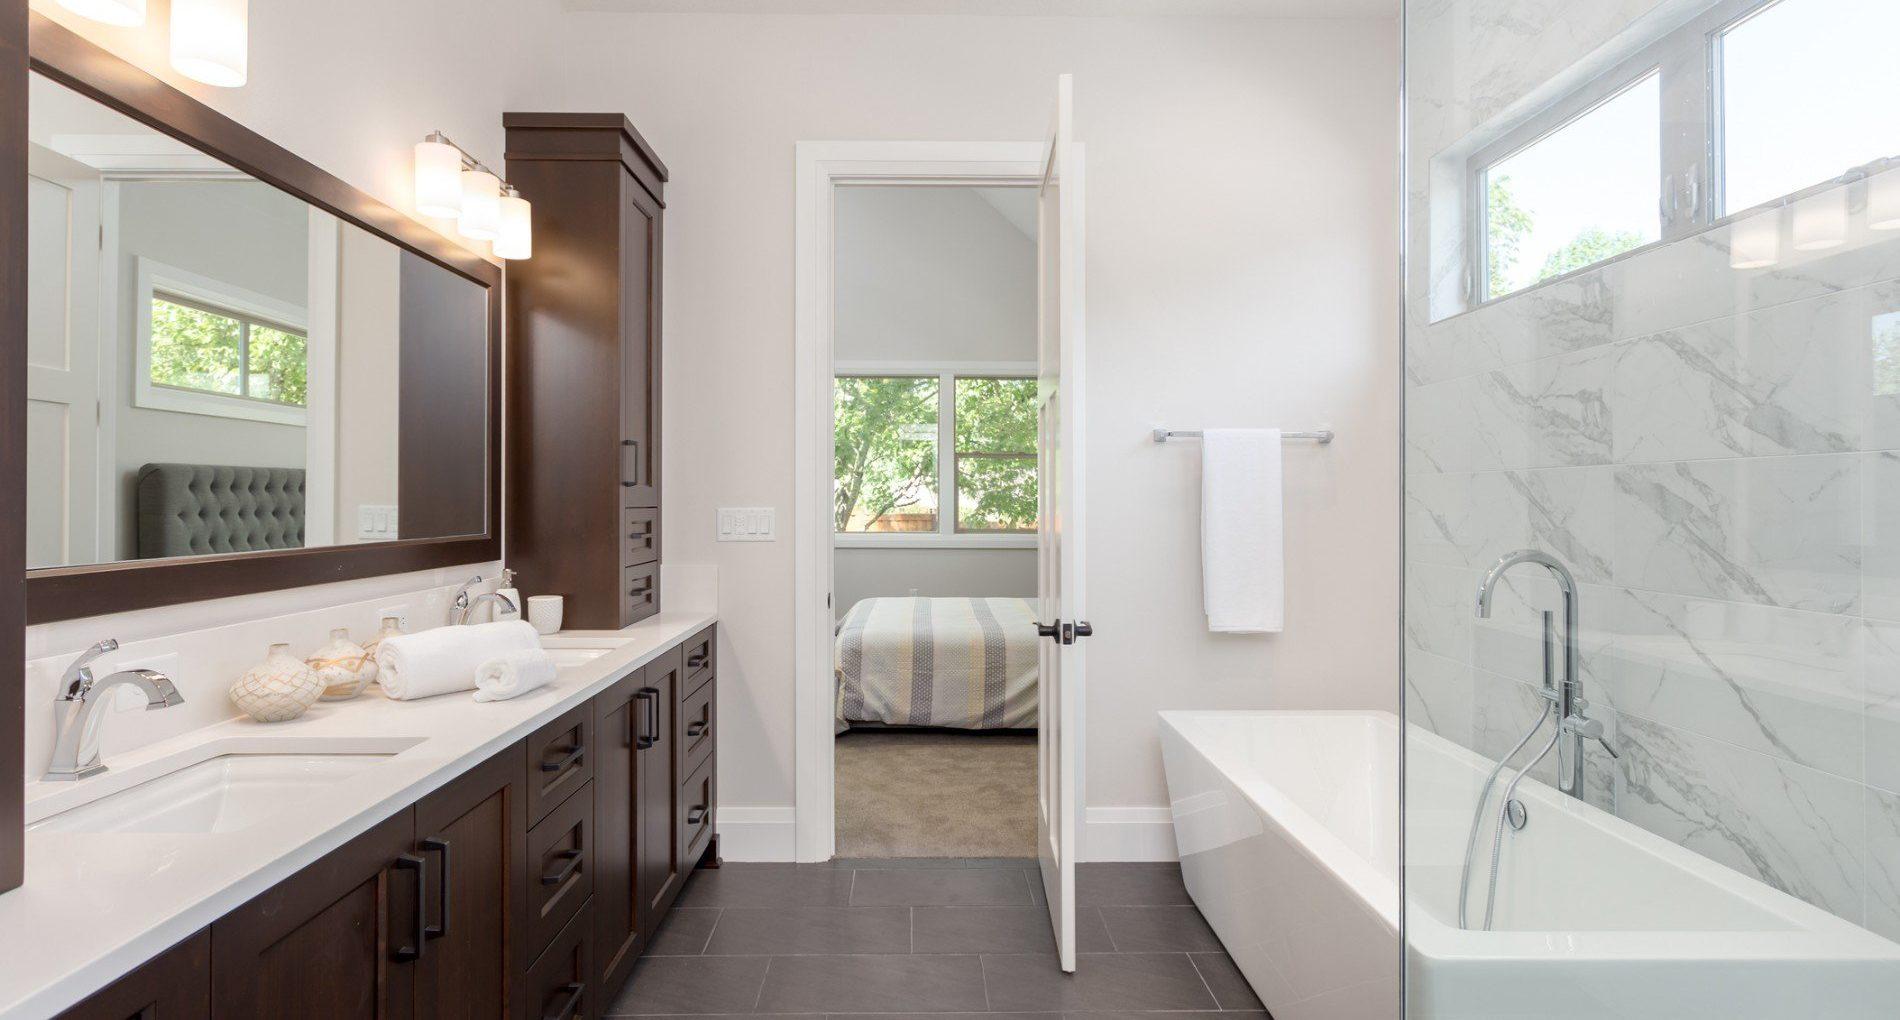 10 Design Ideas to Make Your Custom Bathroom Easier to Clean | Alair ...